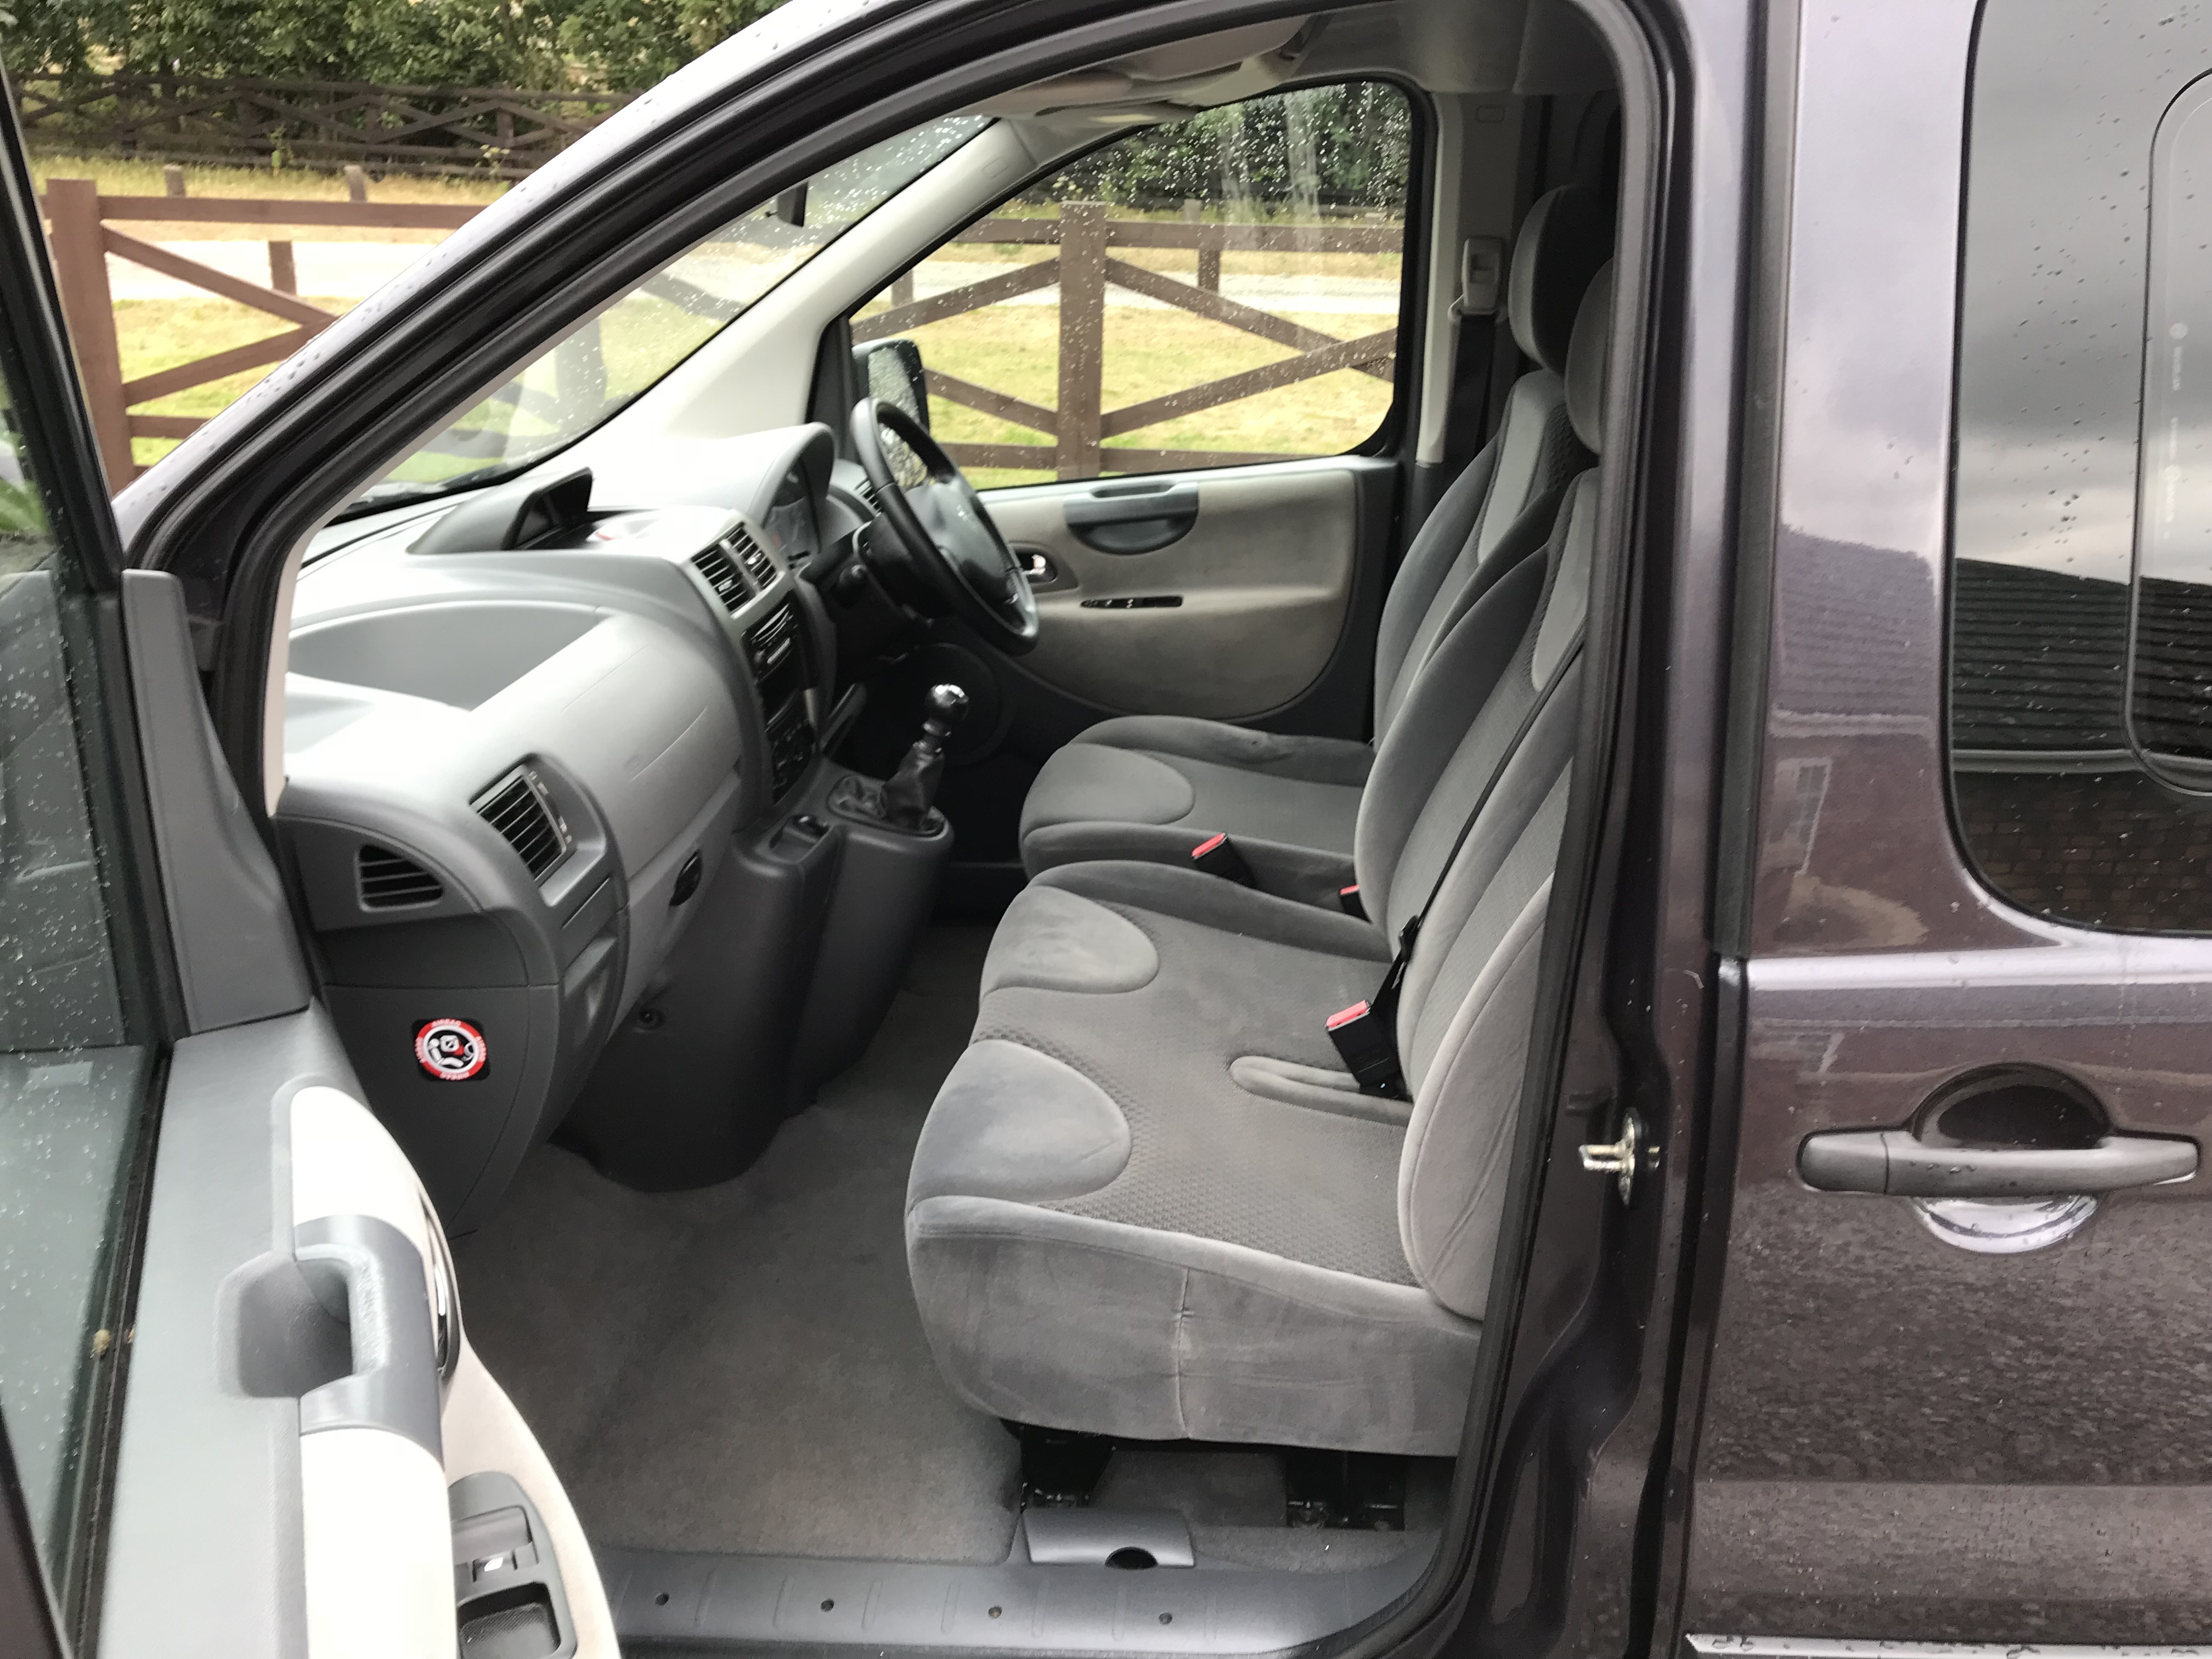 GX11BFZ Expert Wav WR62DZP Caddy 041